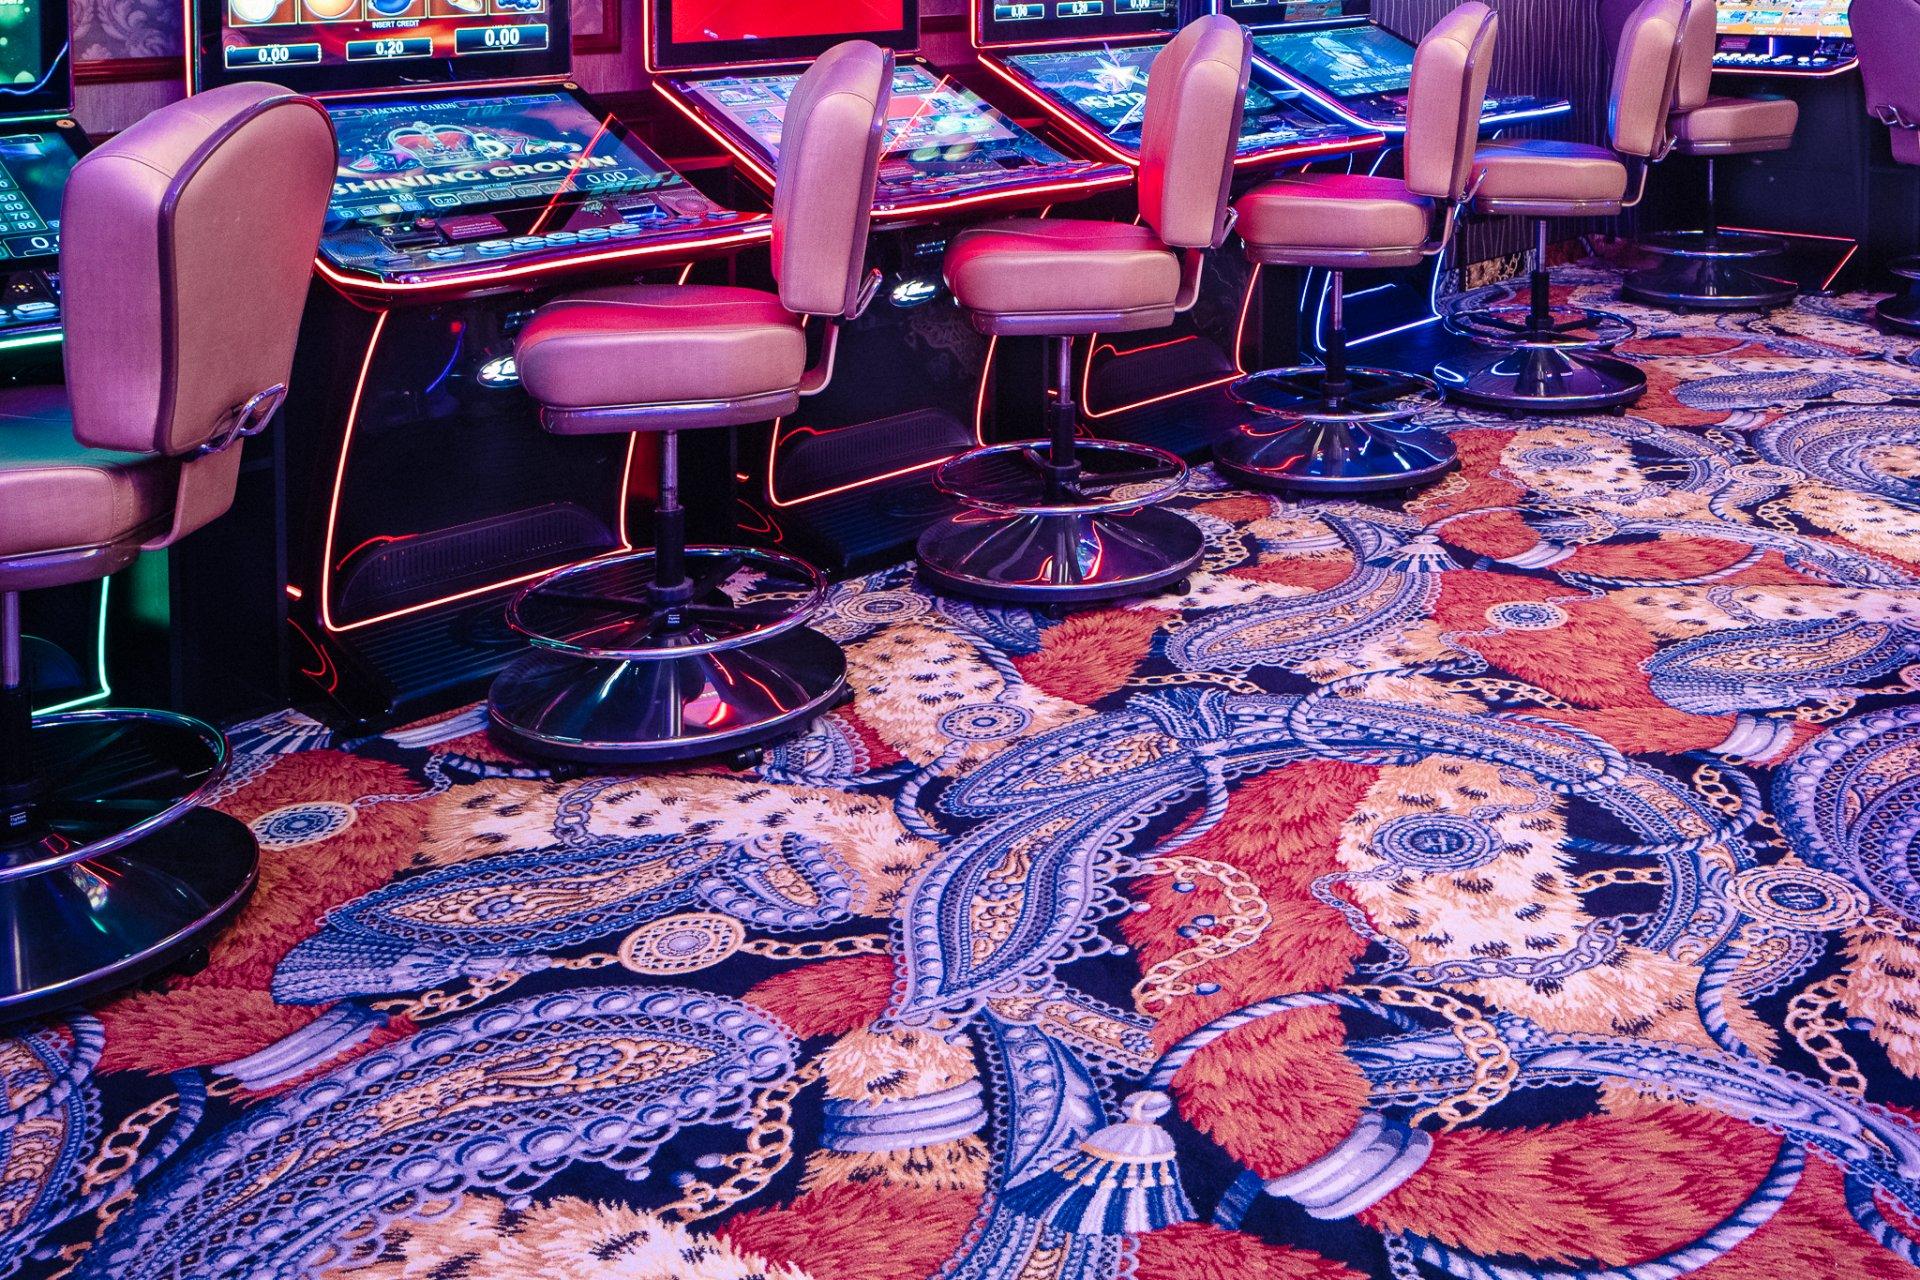 20200608-casino-veranda-copyright-vanillaroads-002